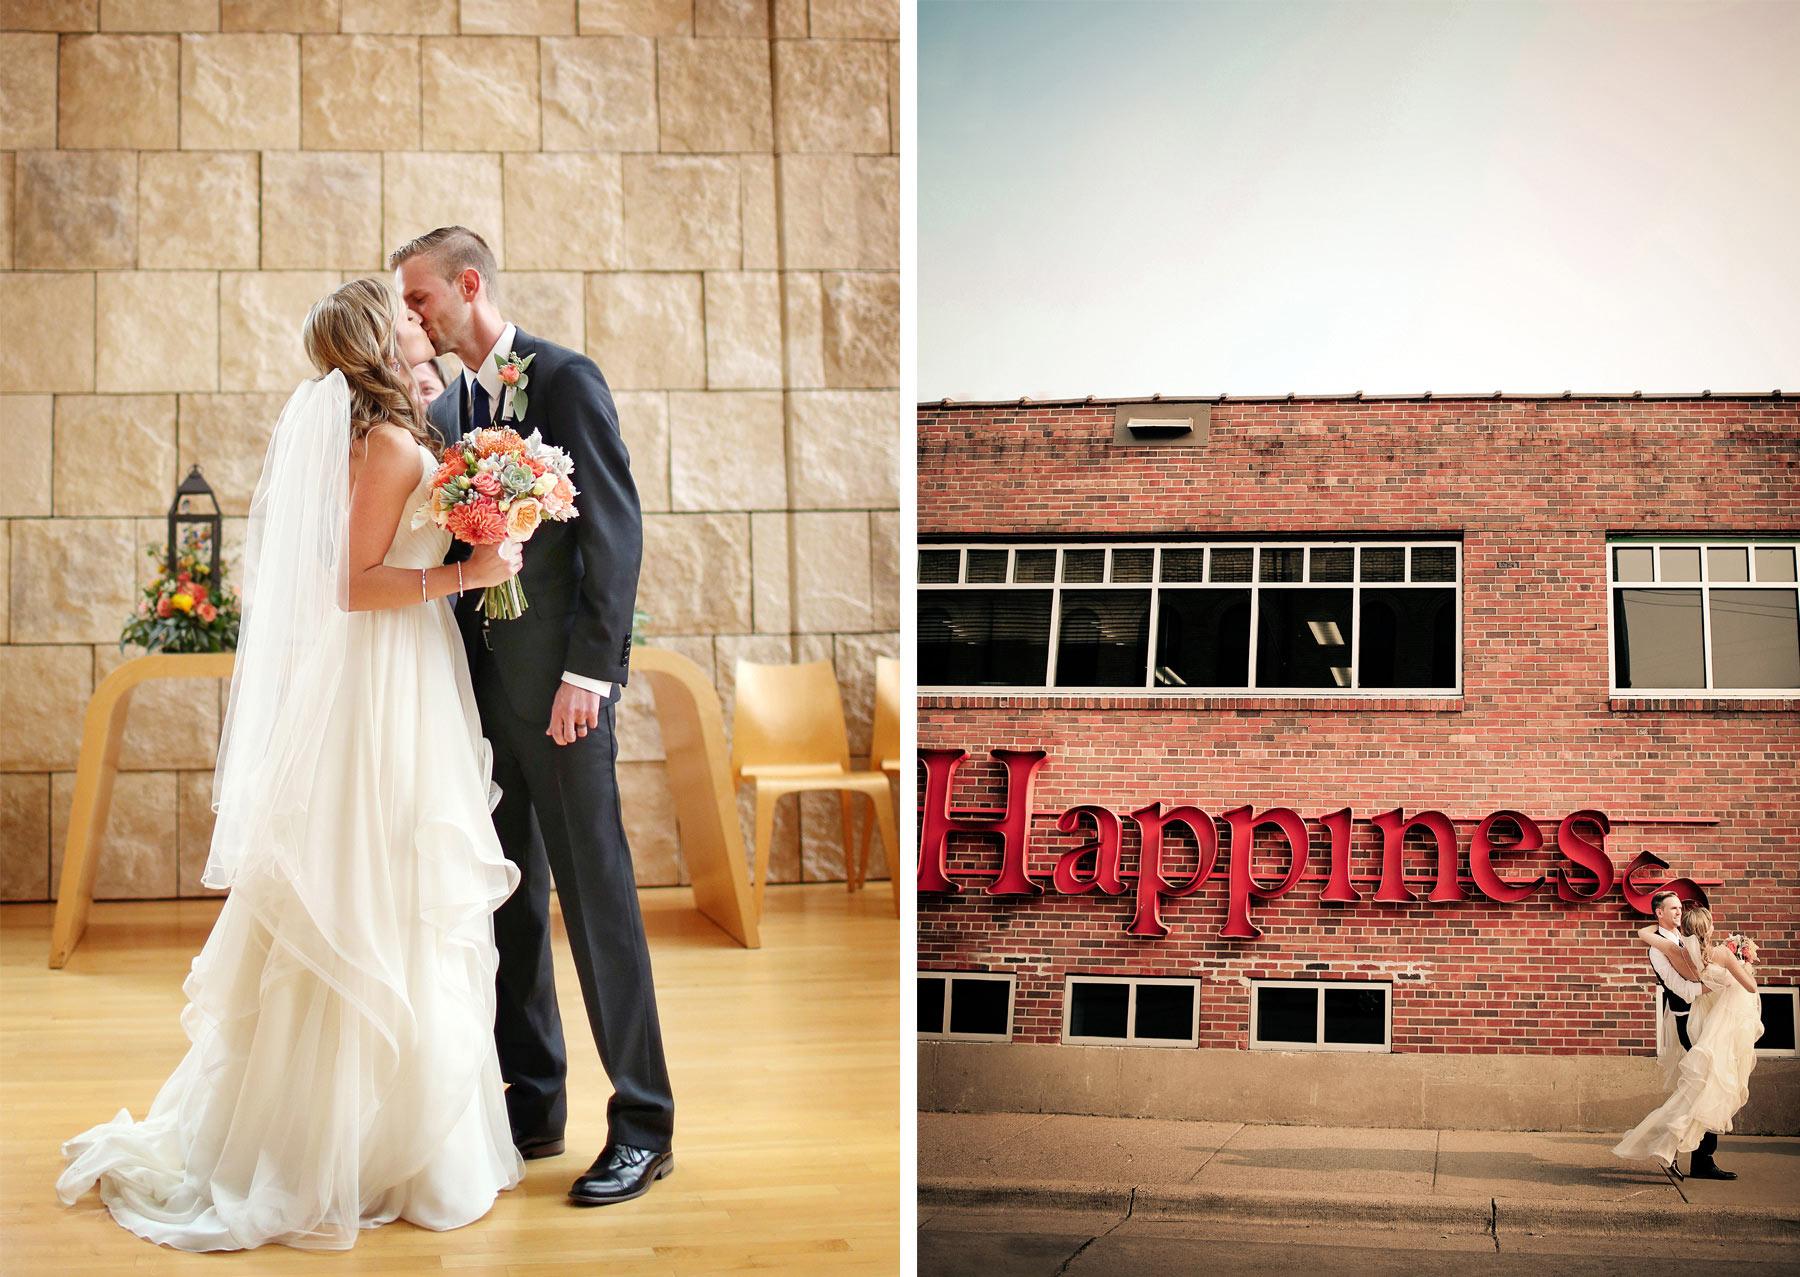 09-Minneapolis-Minnesota-Wedding-Photography-by-Vick-Photography-Bigelow-Chapel-Ceremony-Jess-&-Jake.jpg